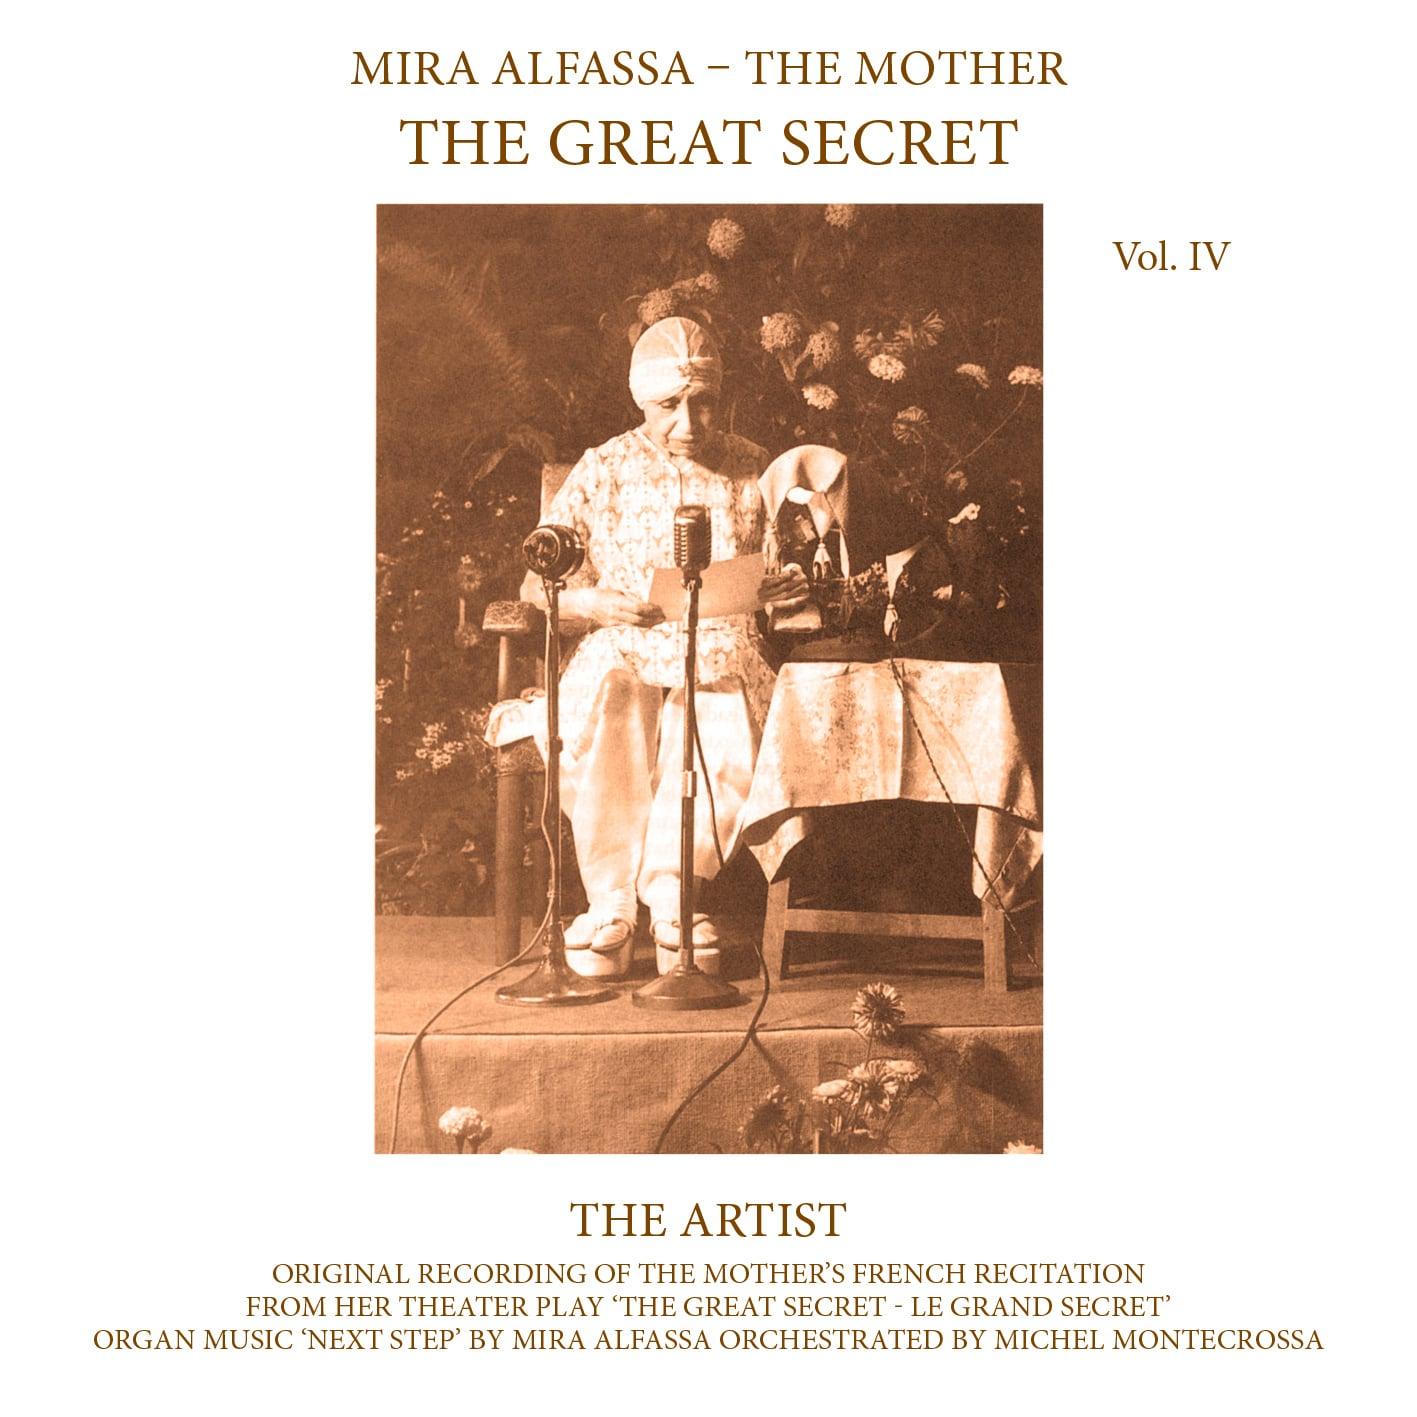 The Great Secret, Vol 4: The Artist